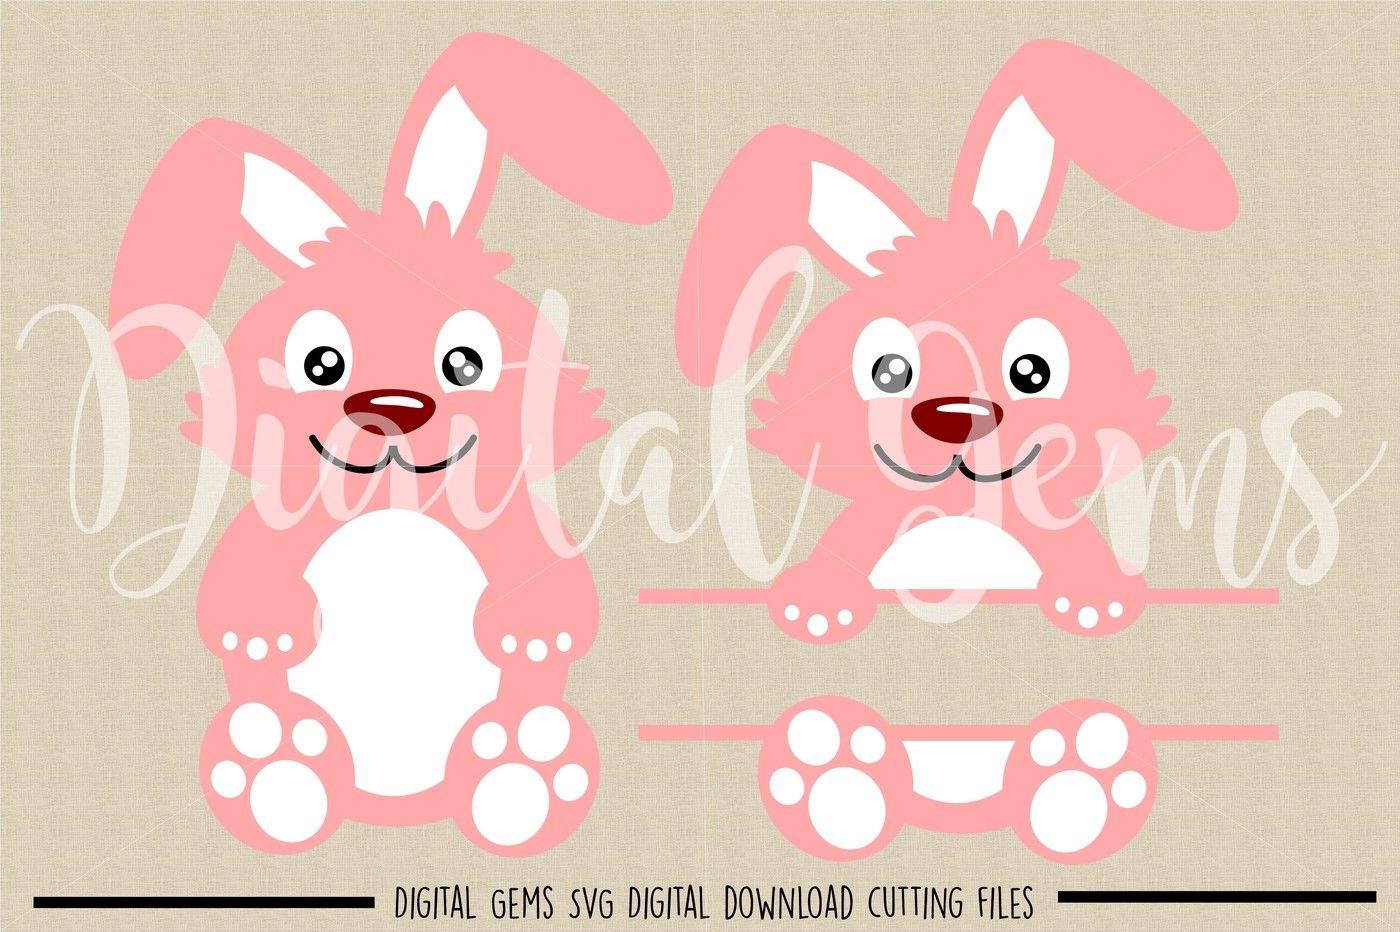 Easter Bunny Rabbit Split Rabbit Svg Dxf Eps Png Files By Digital Gems Thehungryjpeg Com